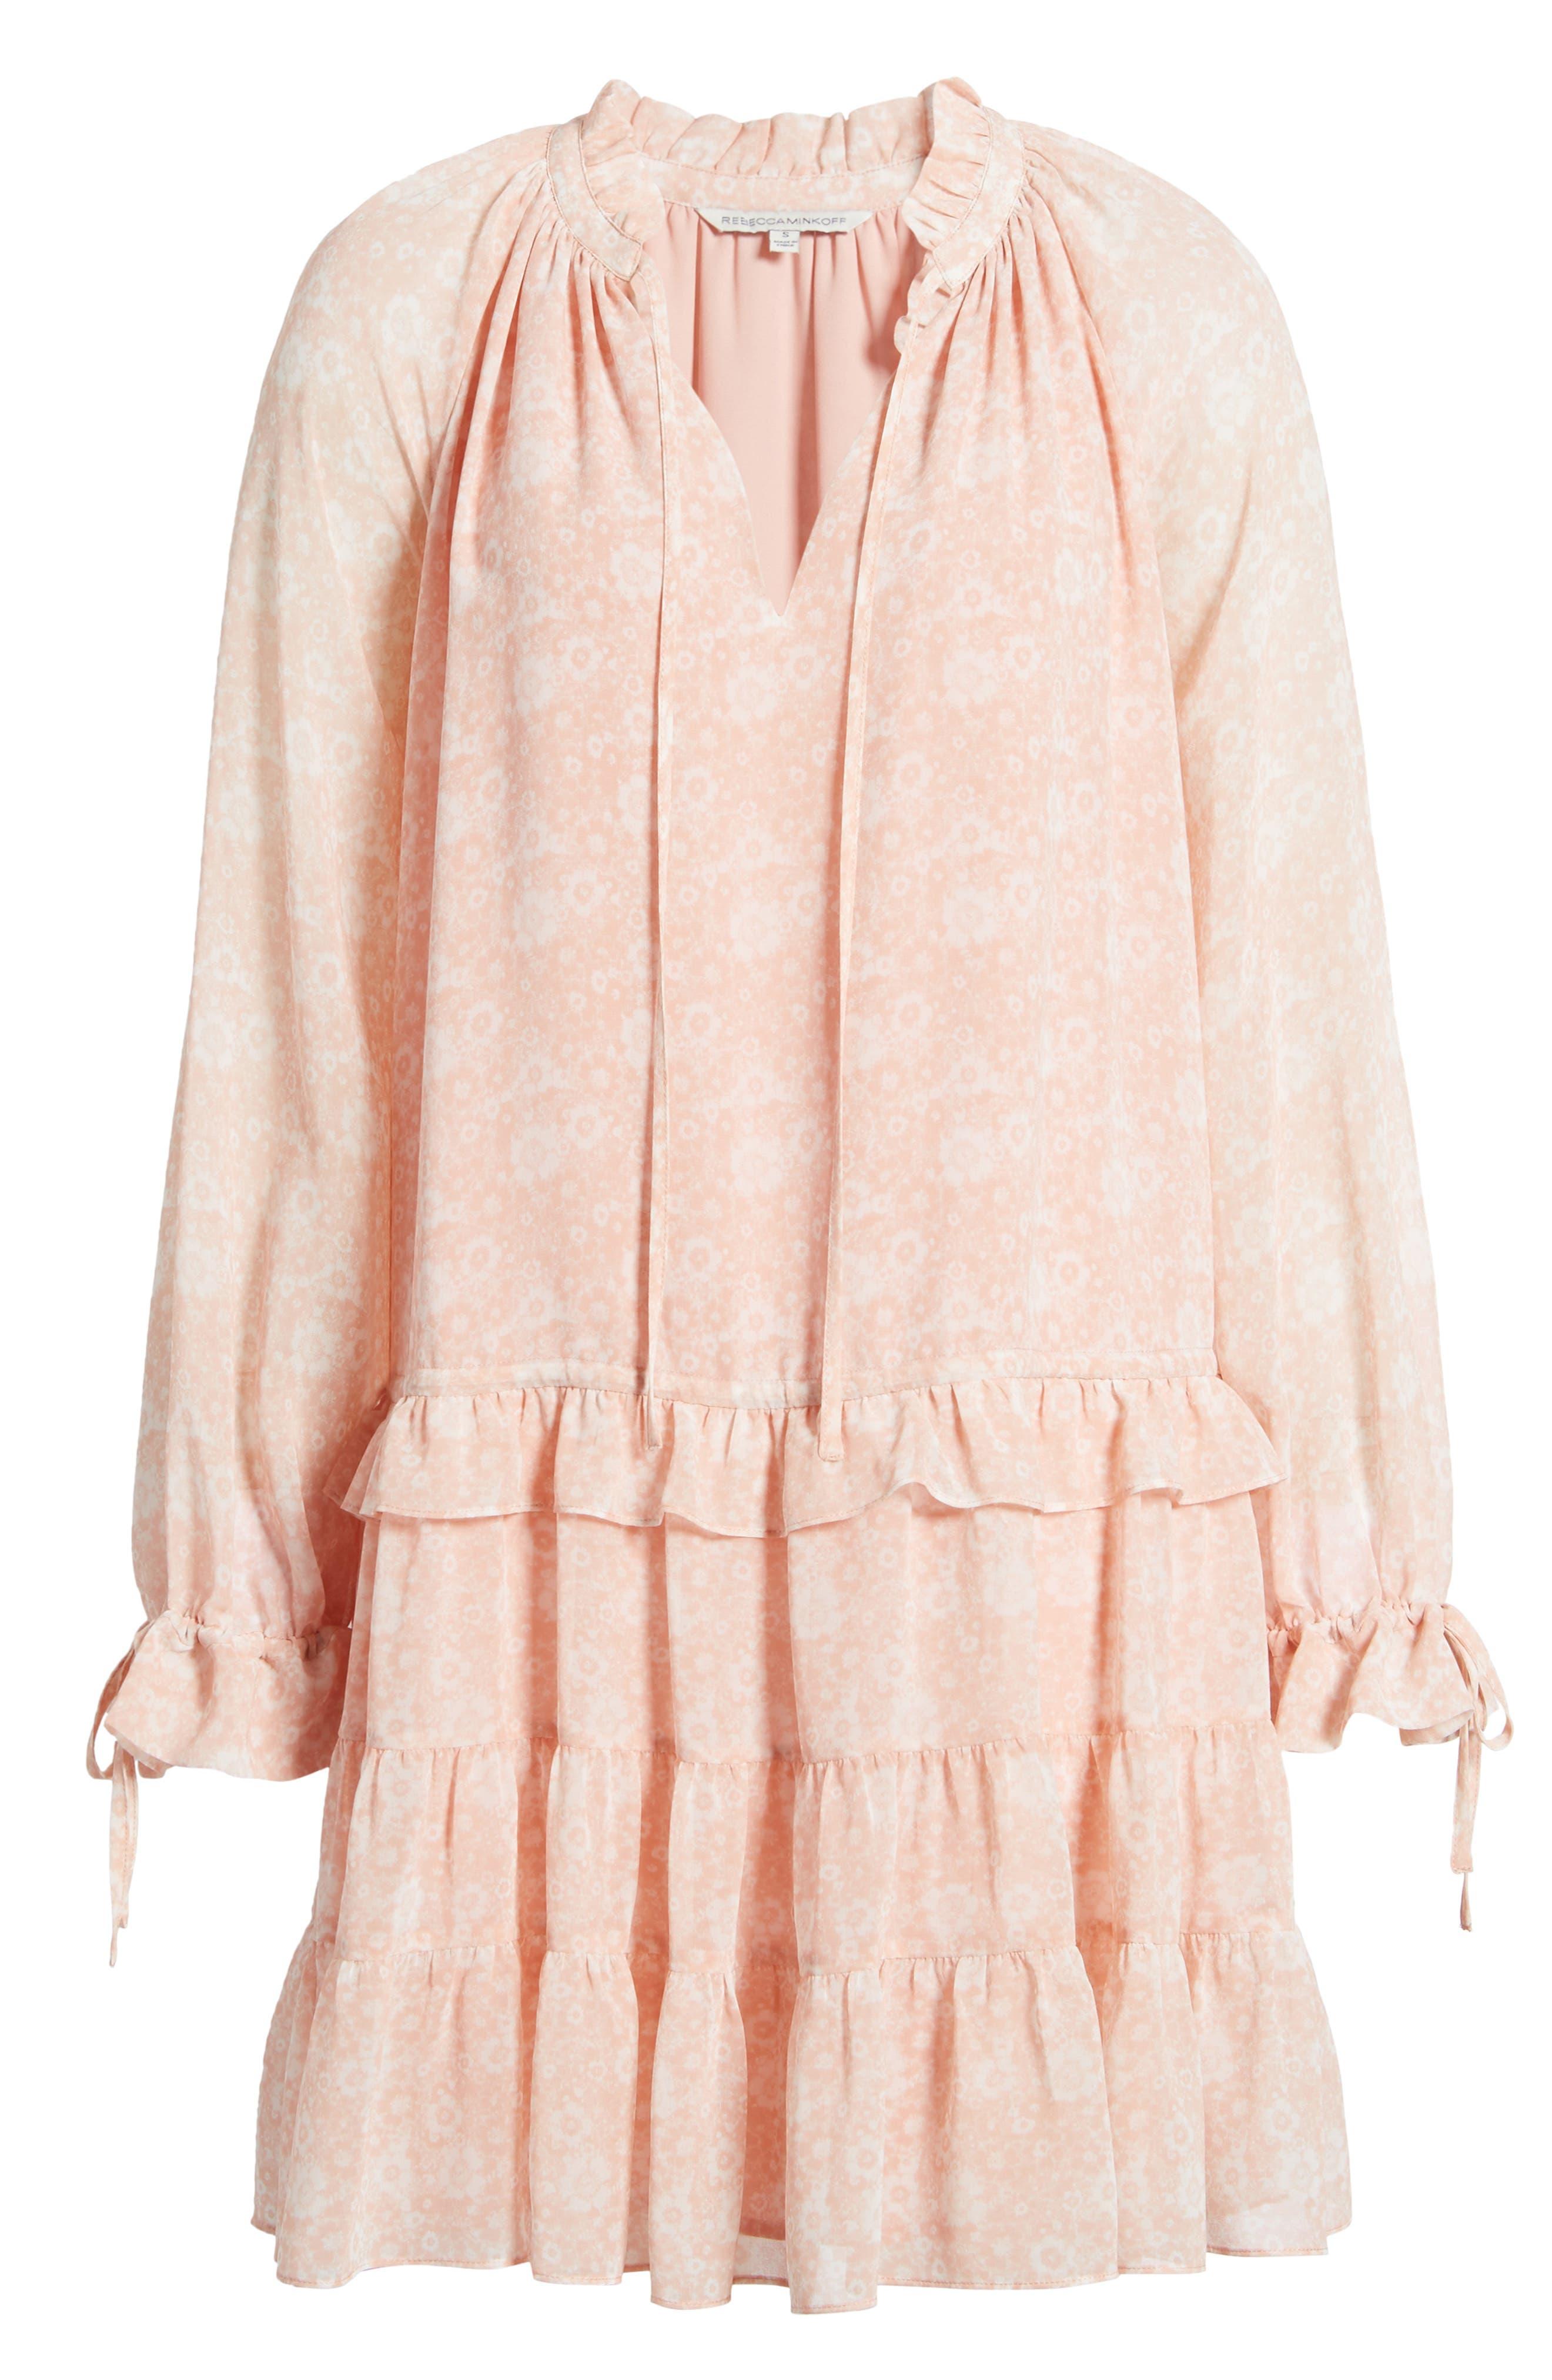 Dylan Drop Waist Dress,                             Alternate thumbnail 6, color,                             Light Pink Multi